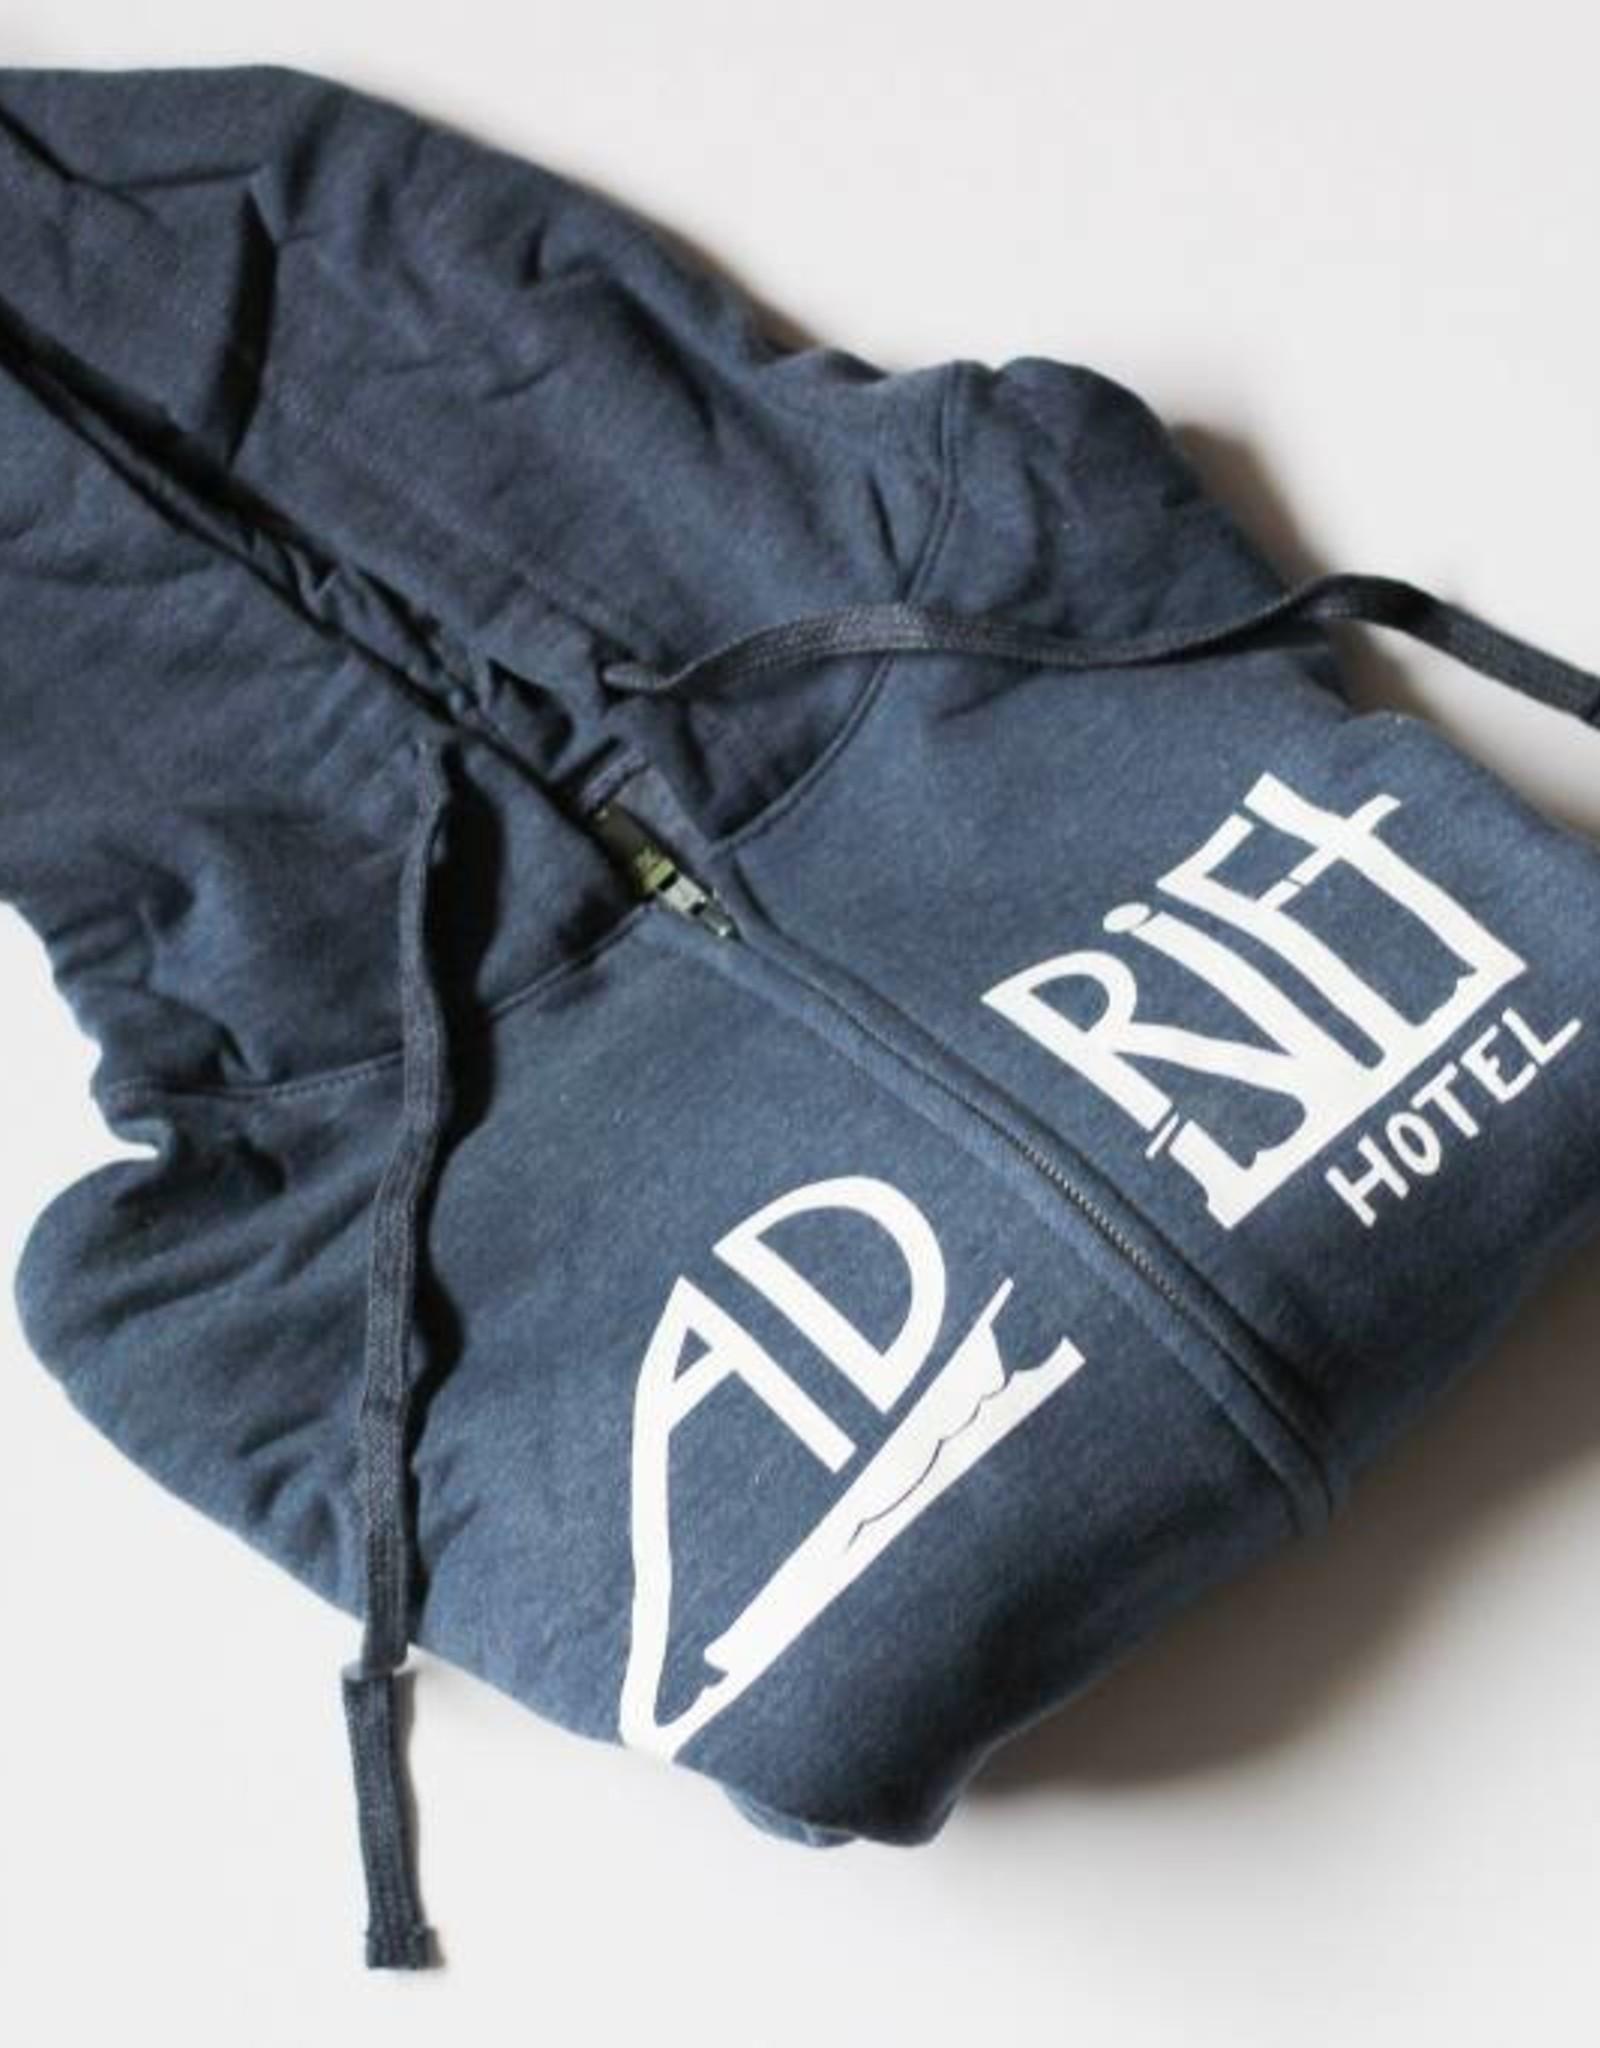 Adrift Jacket